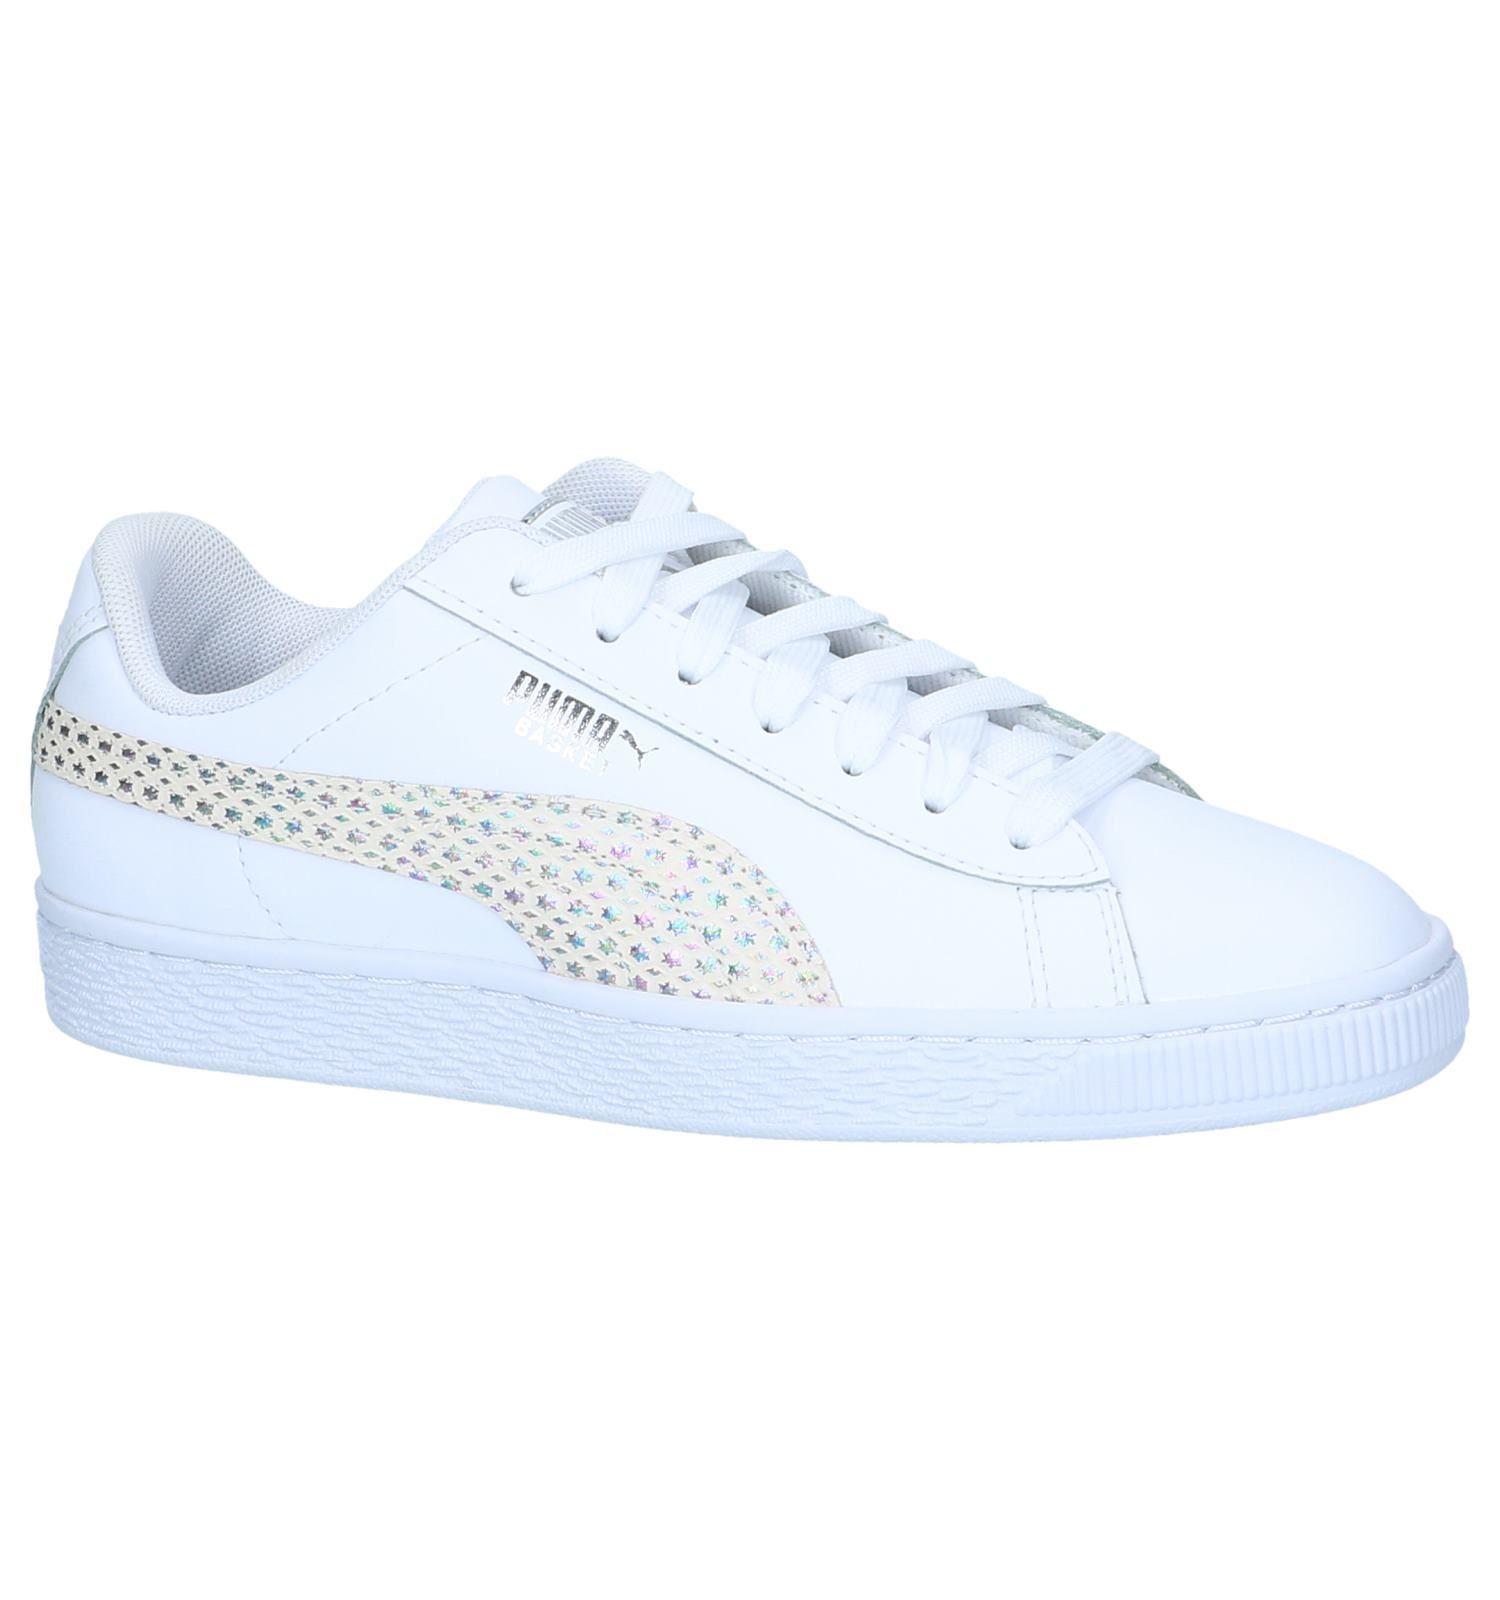 Witte Sneakers Puma Basket Chameleon | TORFS.BE | Gratis ...